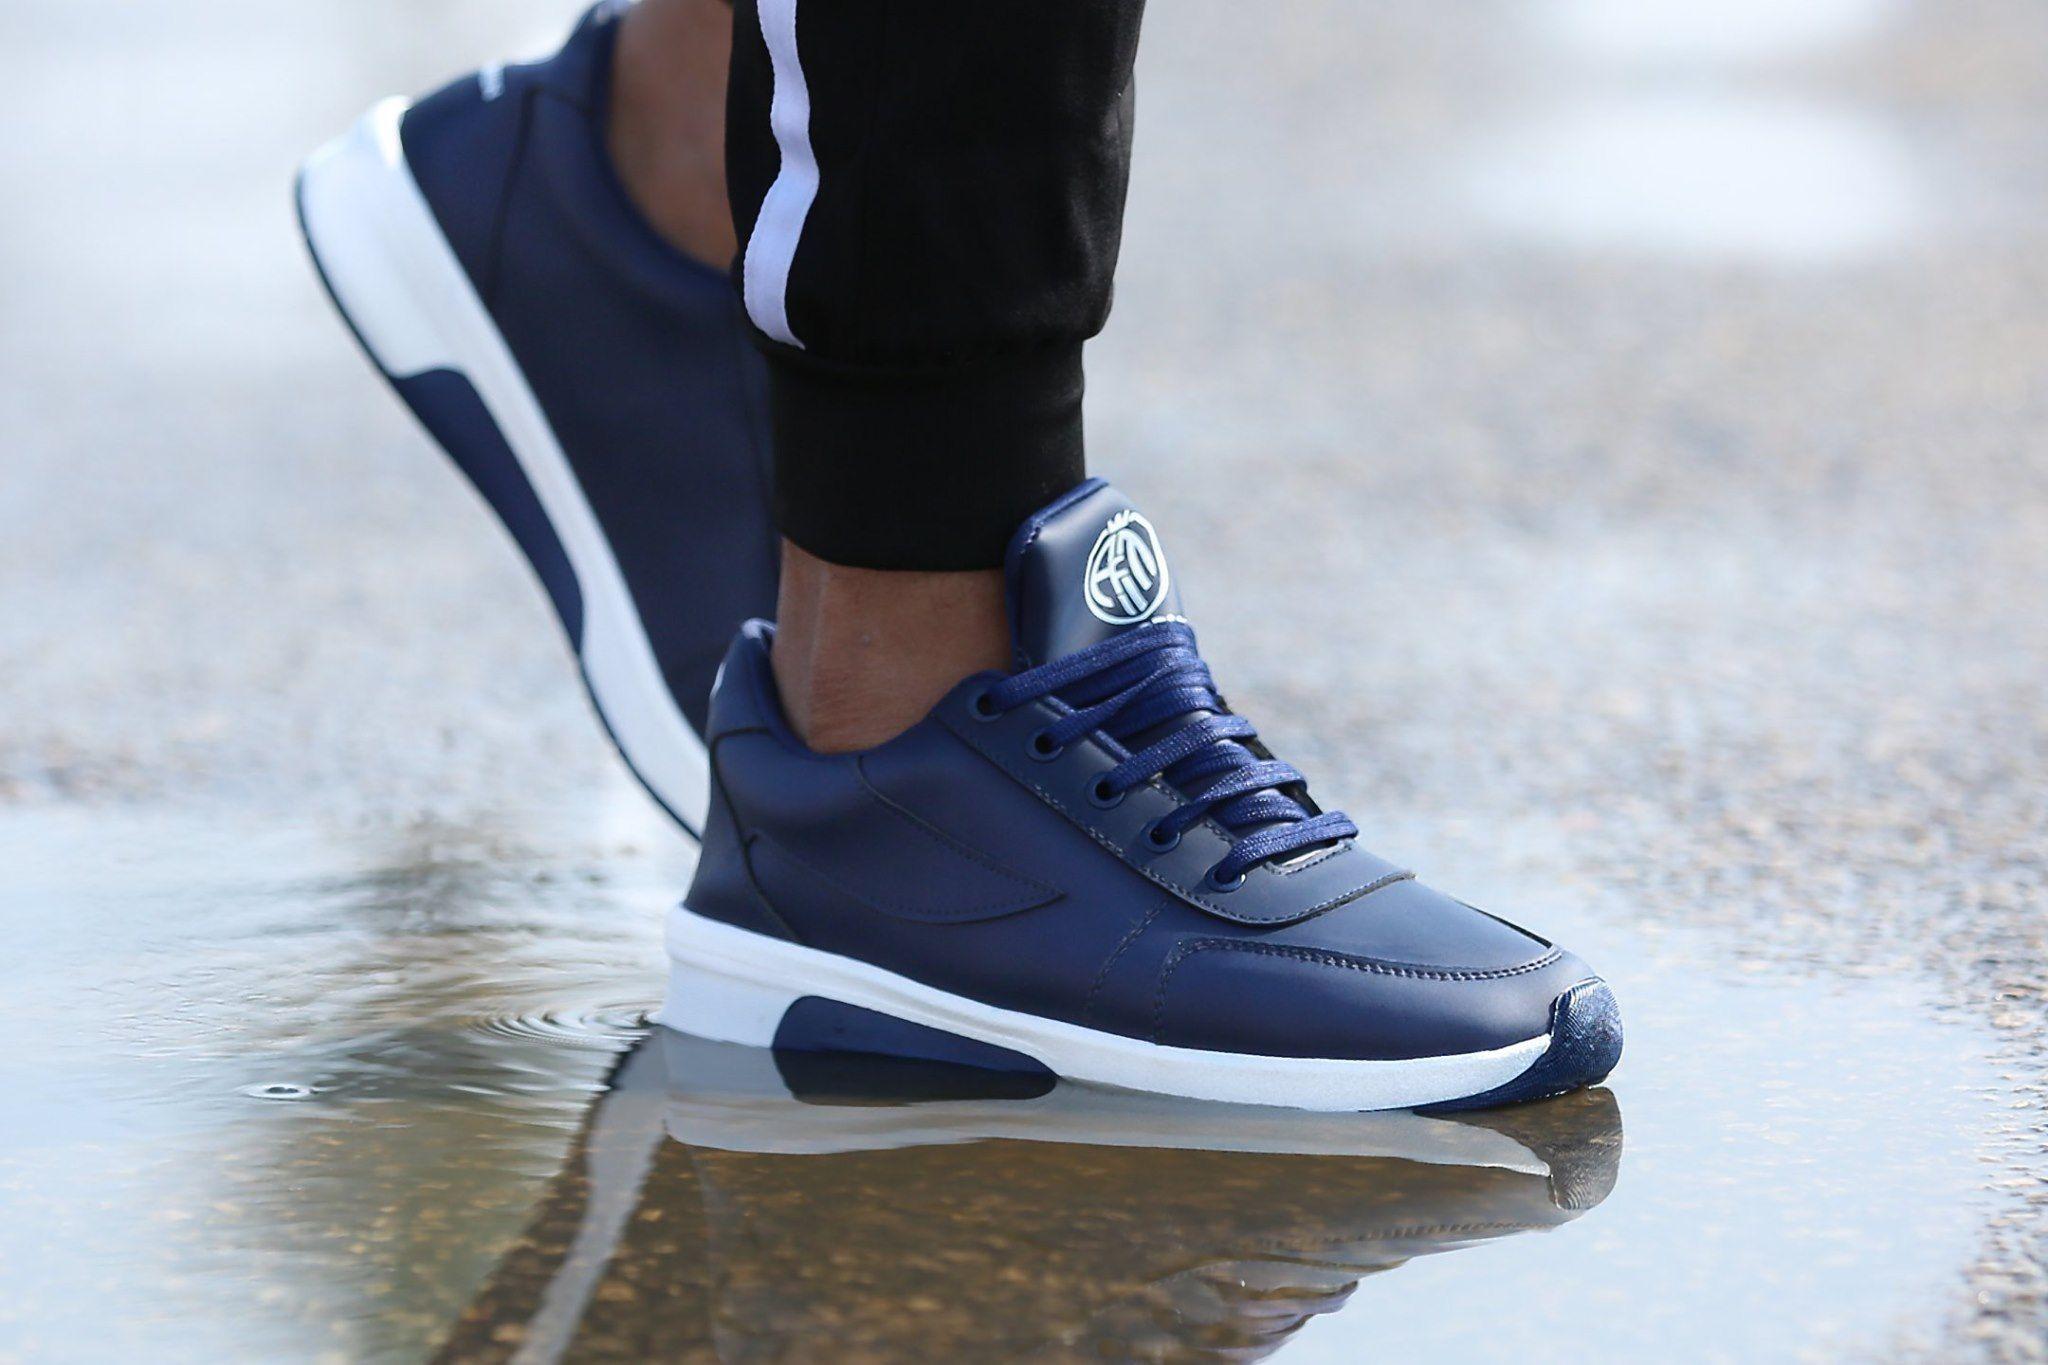 حذاء Amformen اوريجنال اصلي بمميزات الـ1x10 Air Max Sneakers Shoe Brands Nike Air Max